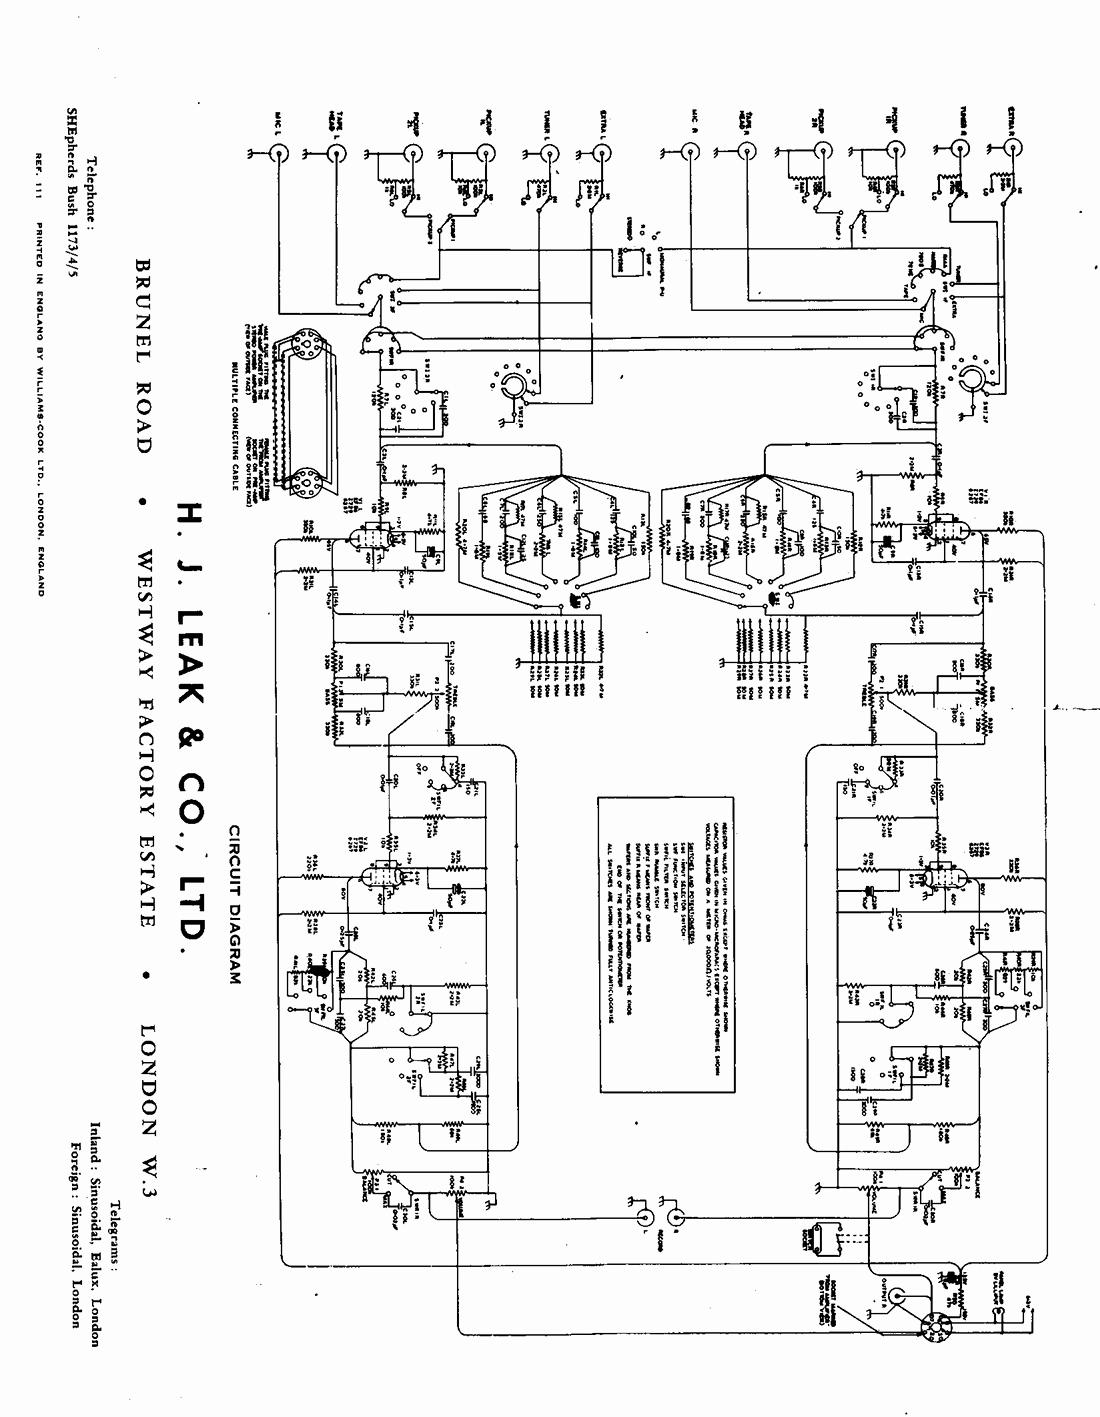 Rockford Fosgate Capacitor Wiring Diagram